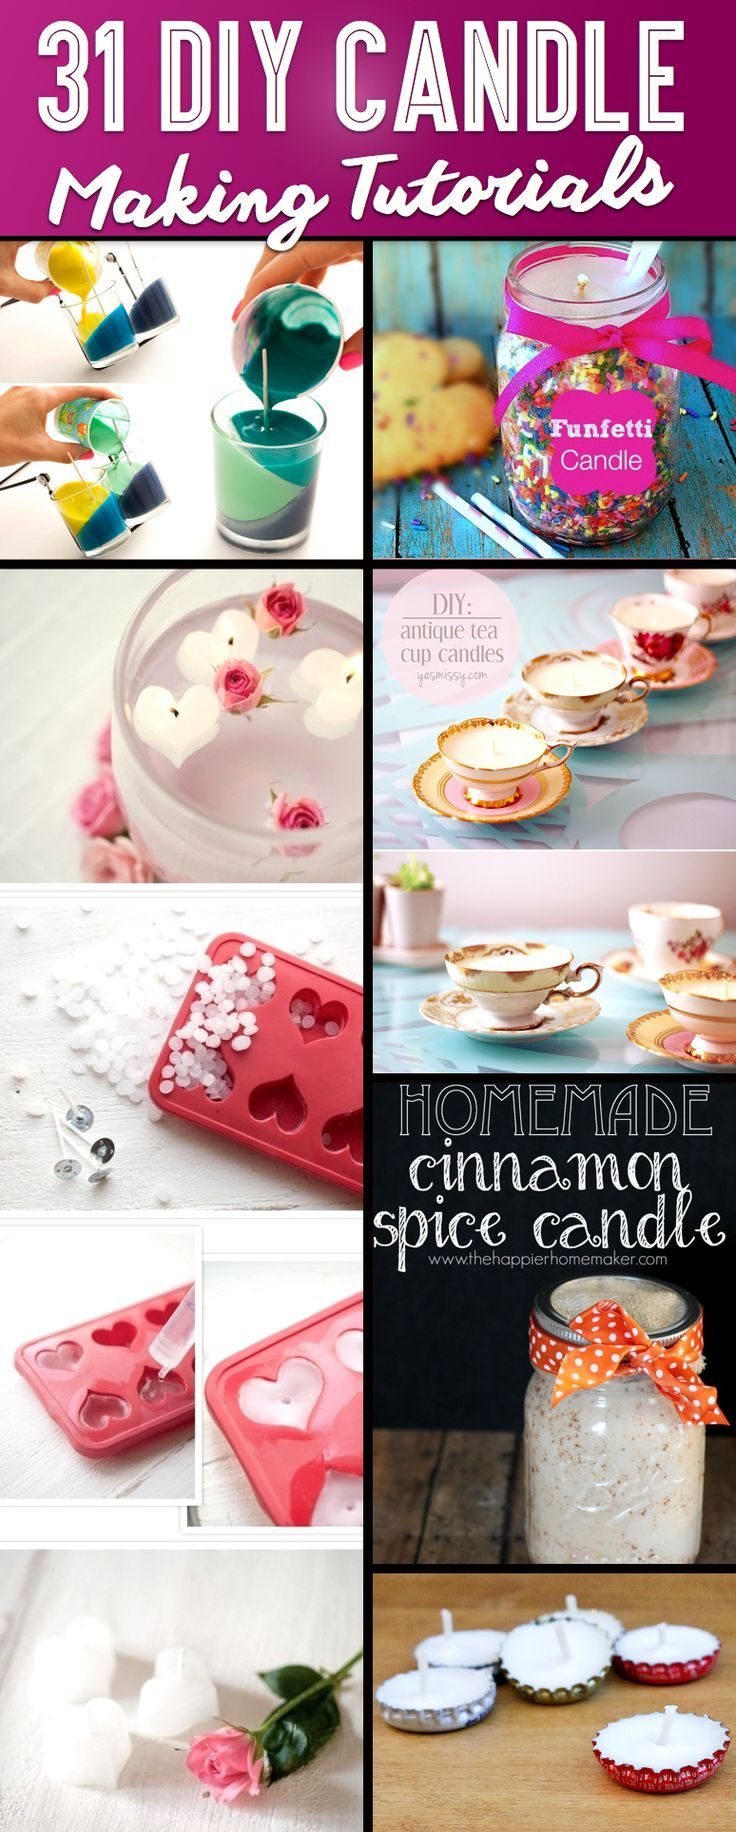 30+ Brilliant DIY Candle Making And Decorating Tutorials